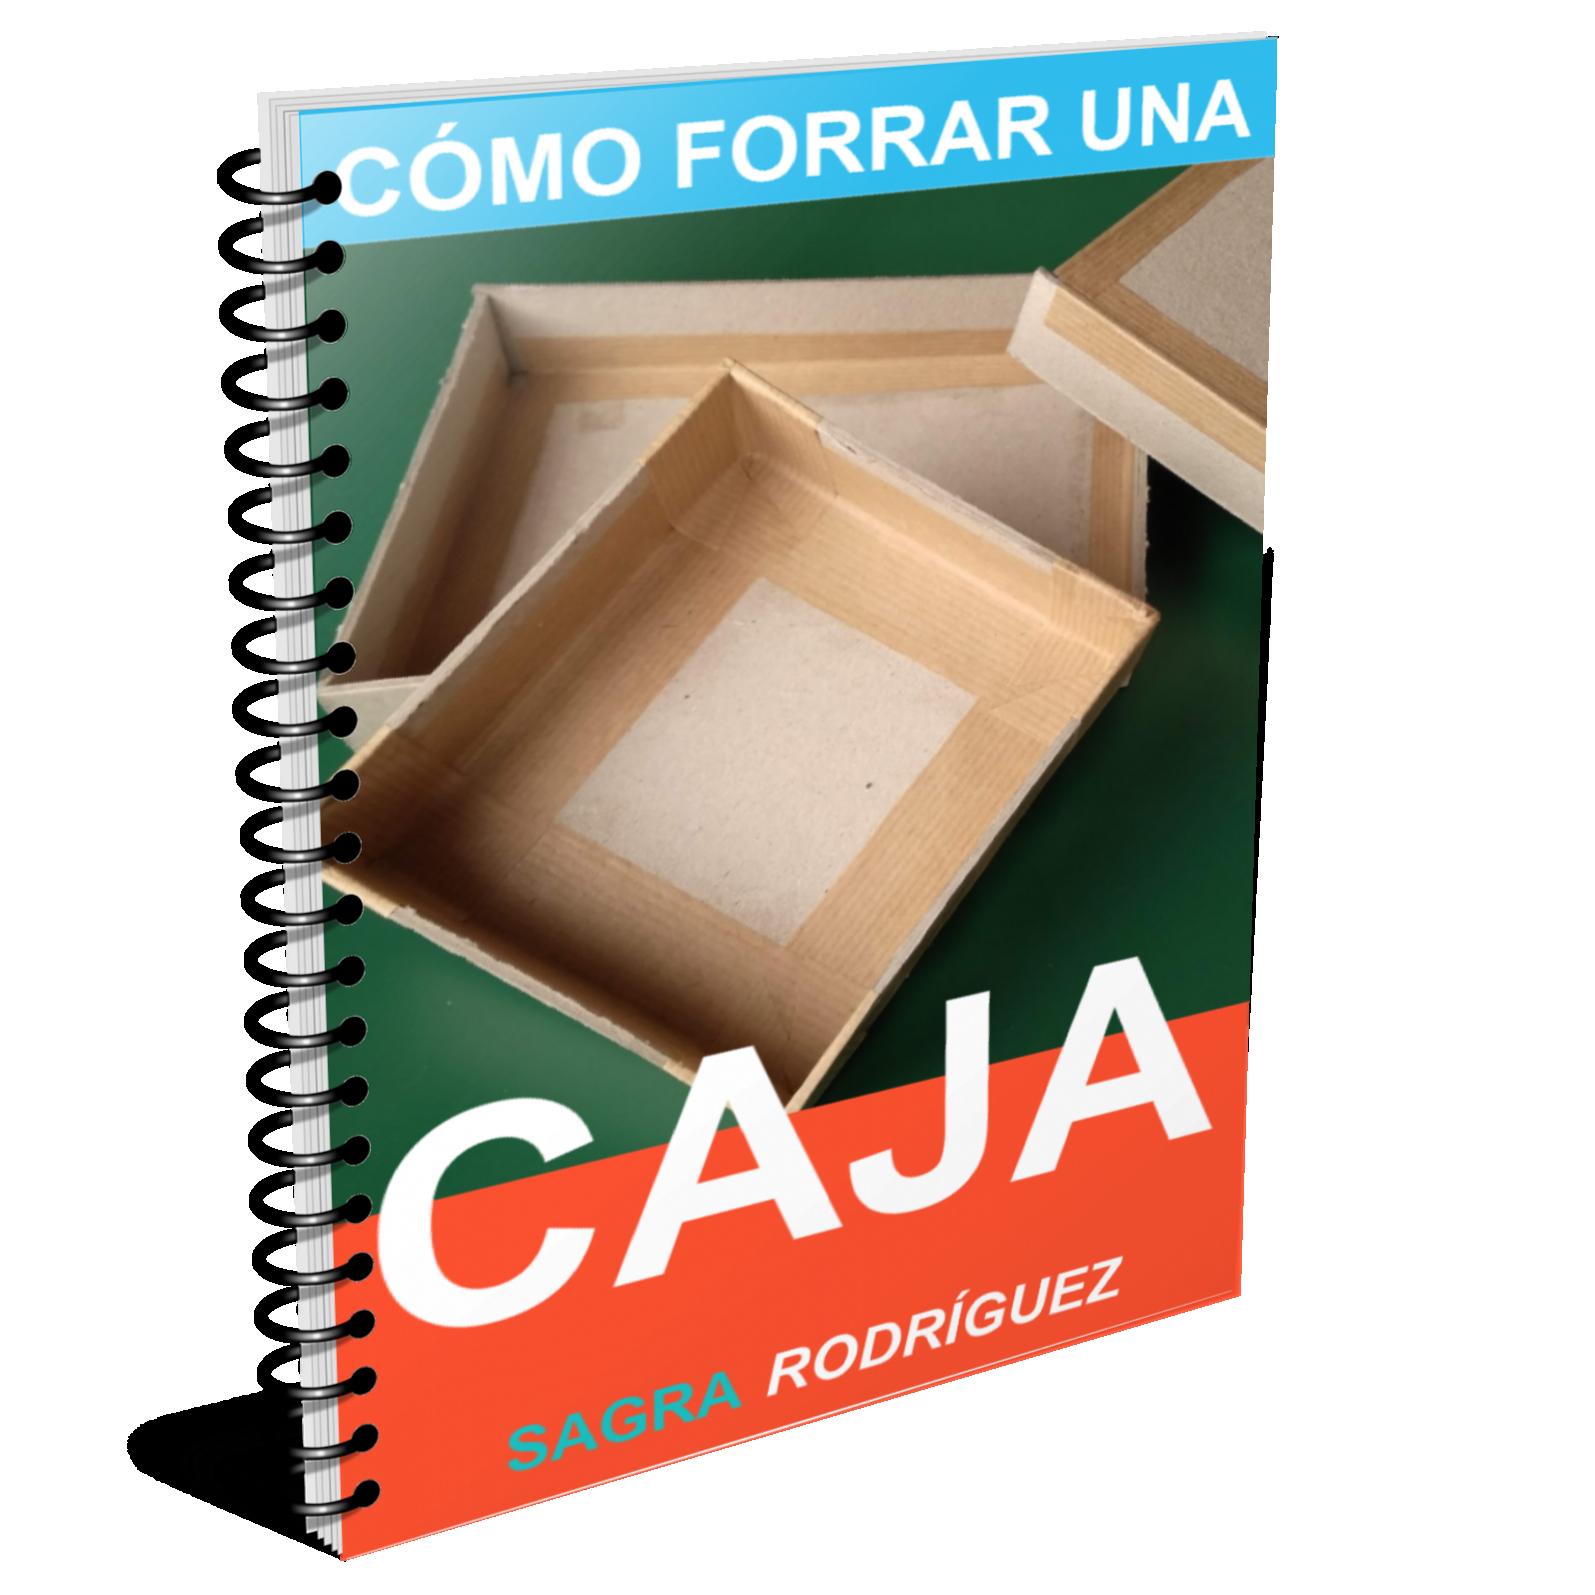 Ebook para aprender a forrar una caja según las técnicas del cartonaje